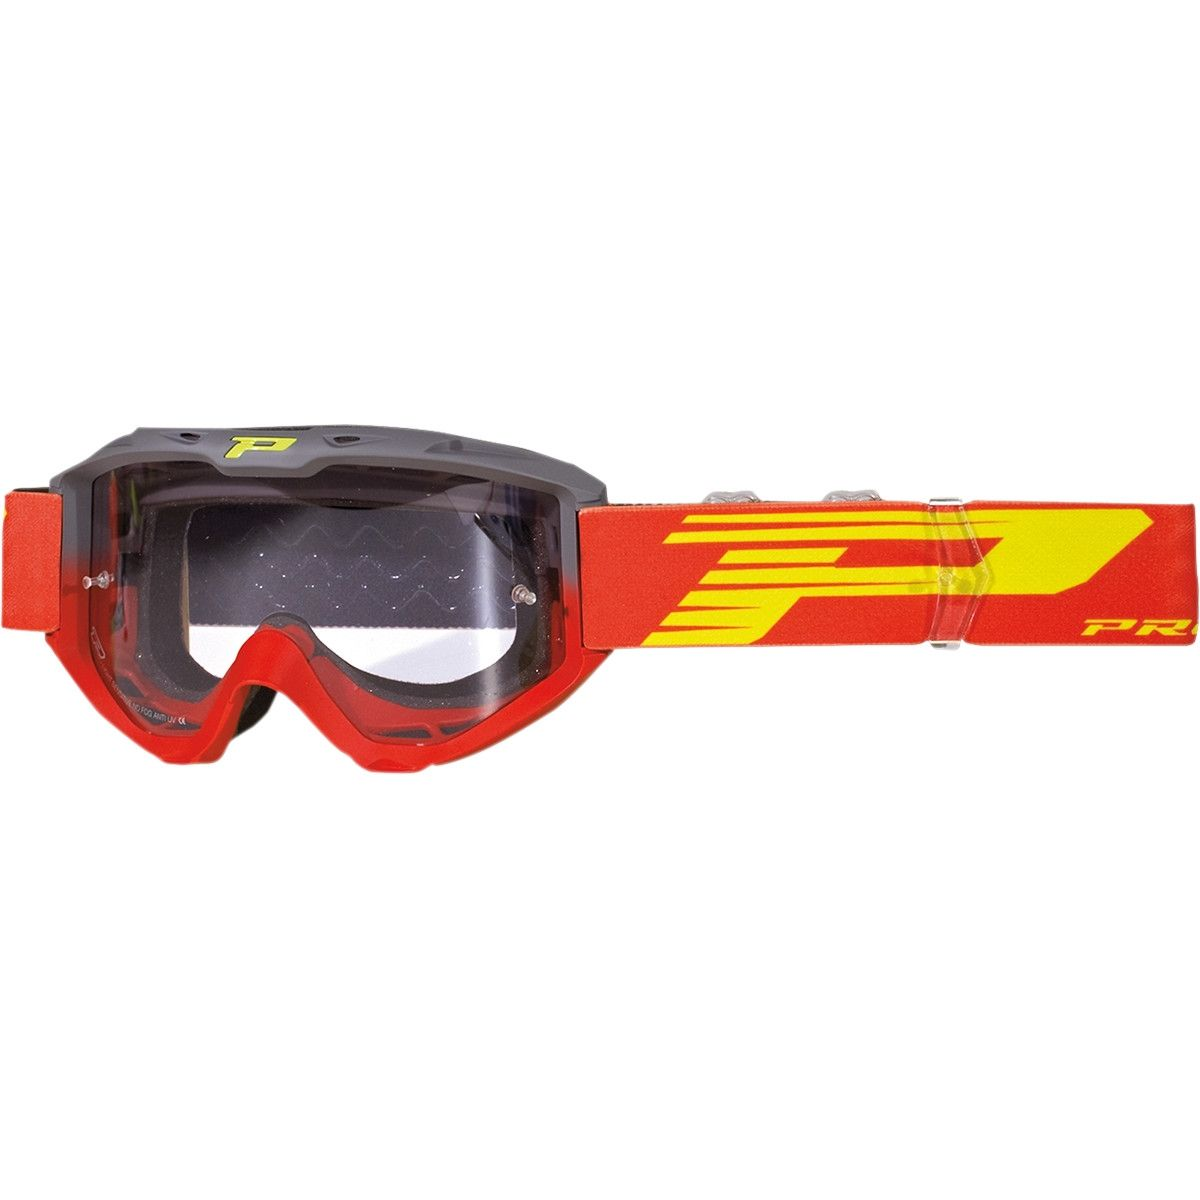 Progrip Crossbril 3450 Light Sensitive Riot Red/Grey